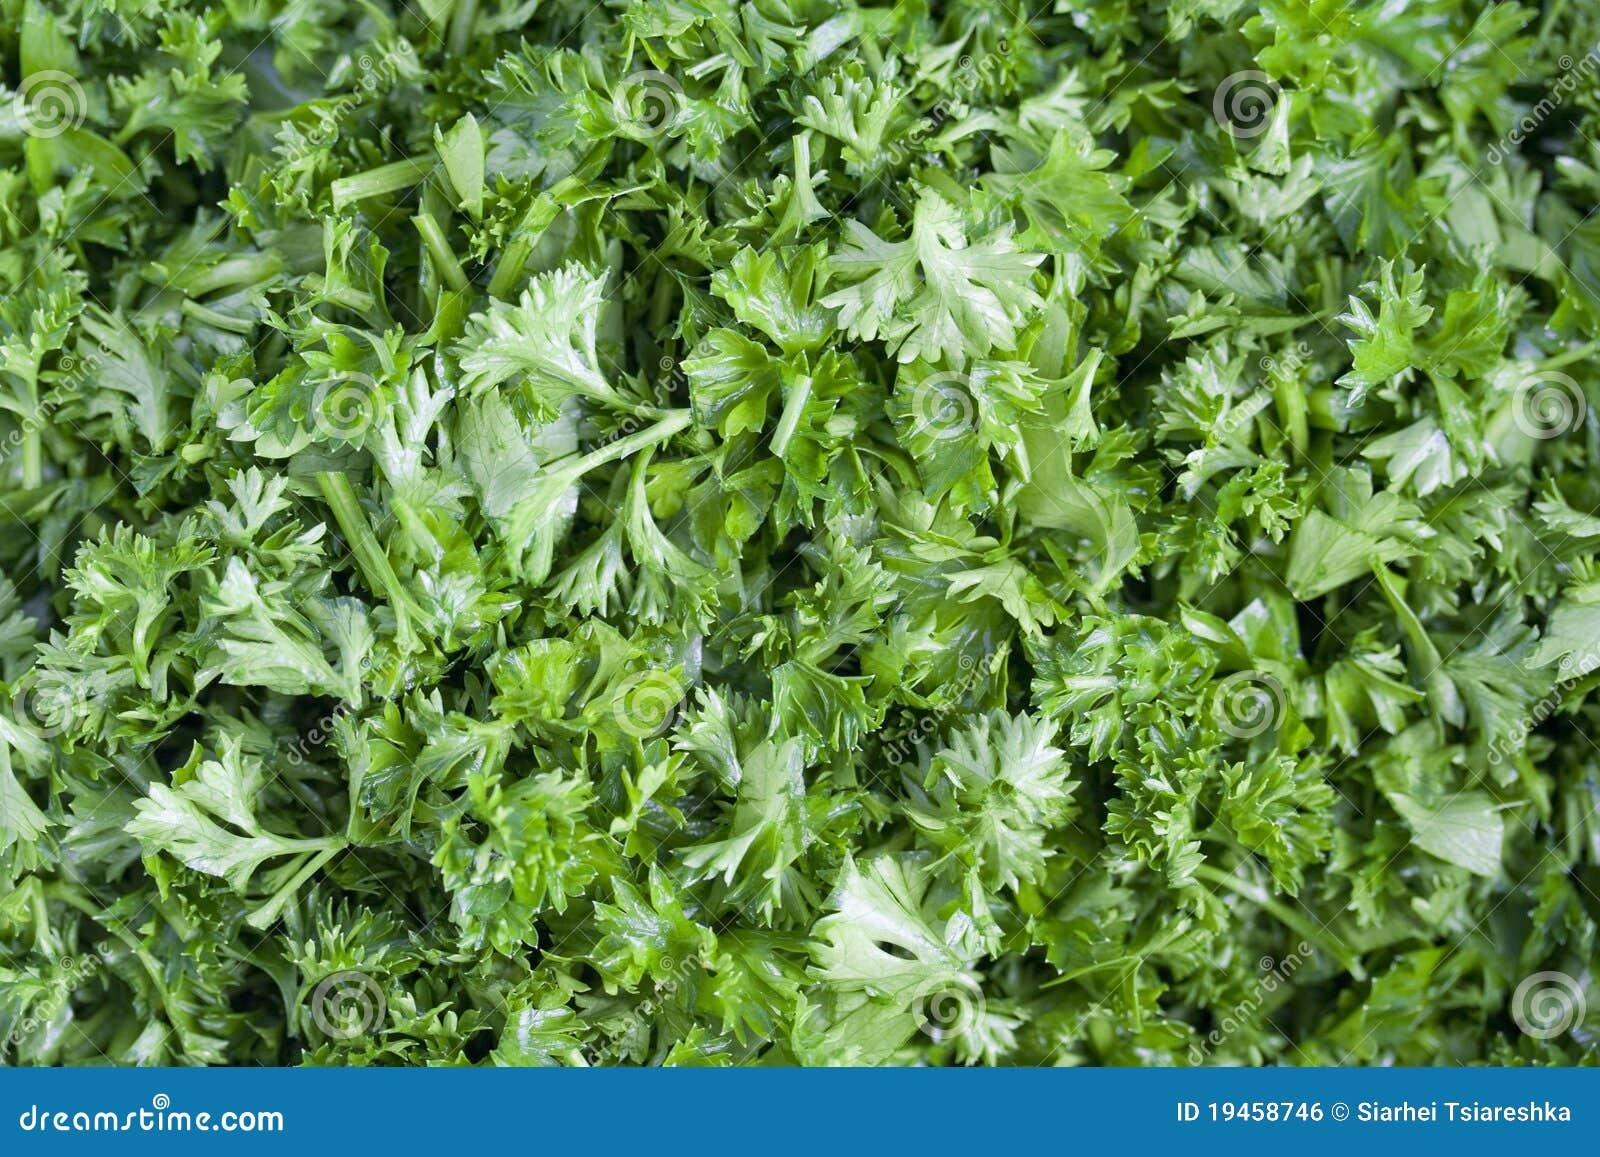 how to keep cut parsley fresh